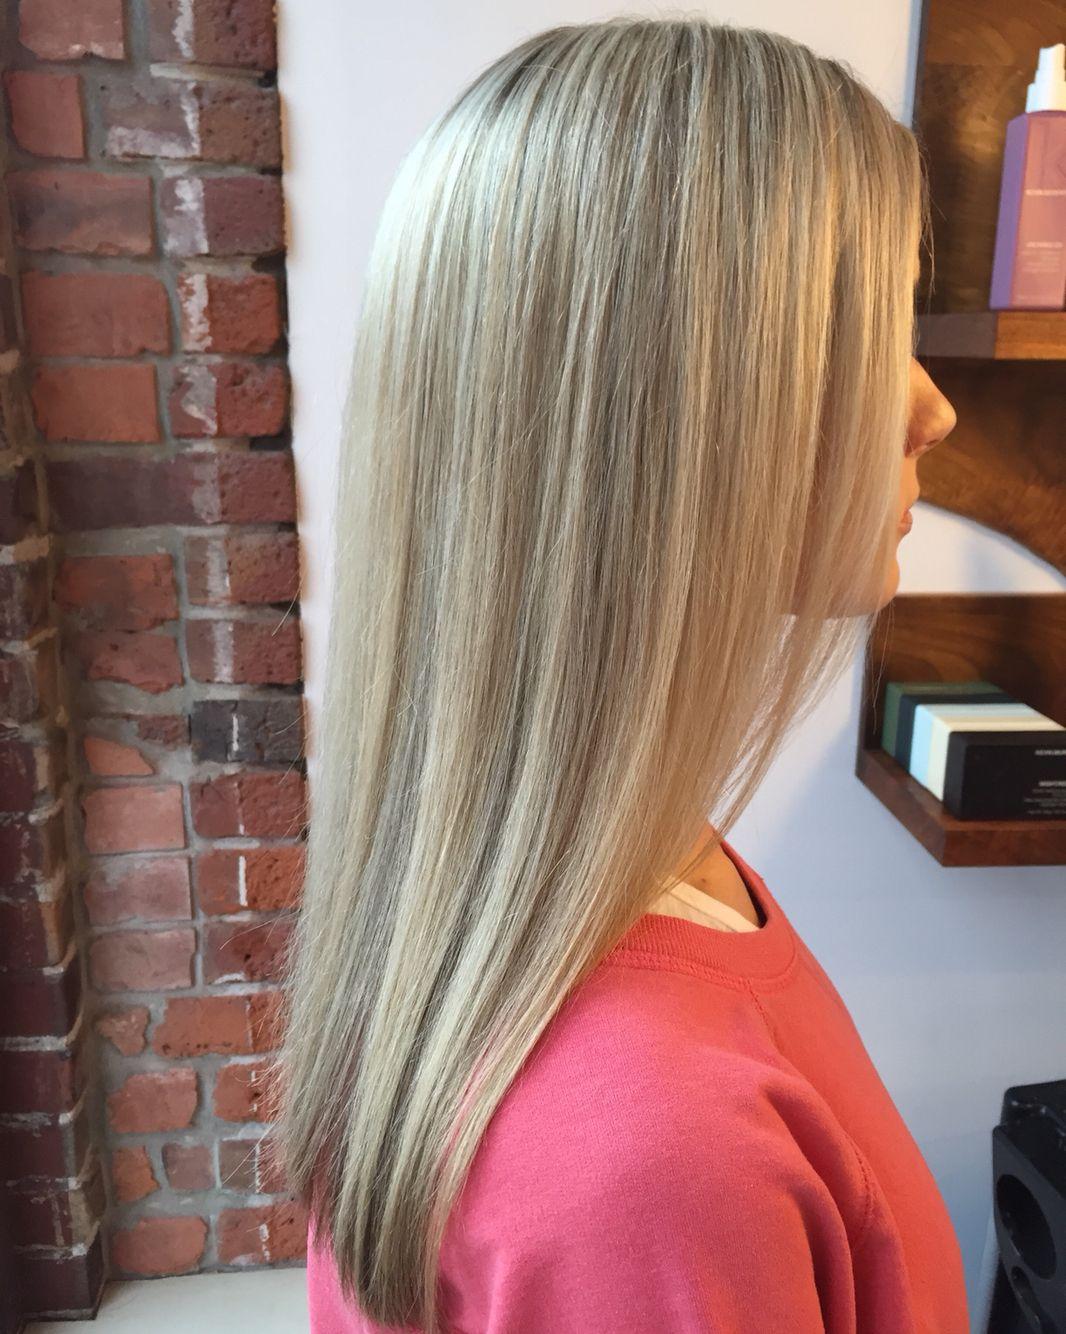 Art color hair - Gorgeous Soft Blonde Color By Me Instagram Veronicagomeshair Blonde Colorhair Artinstagramblondescolors